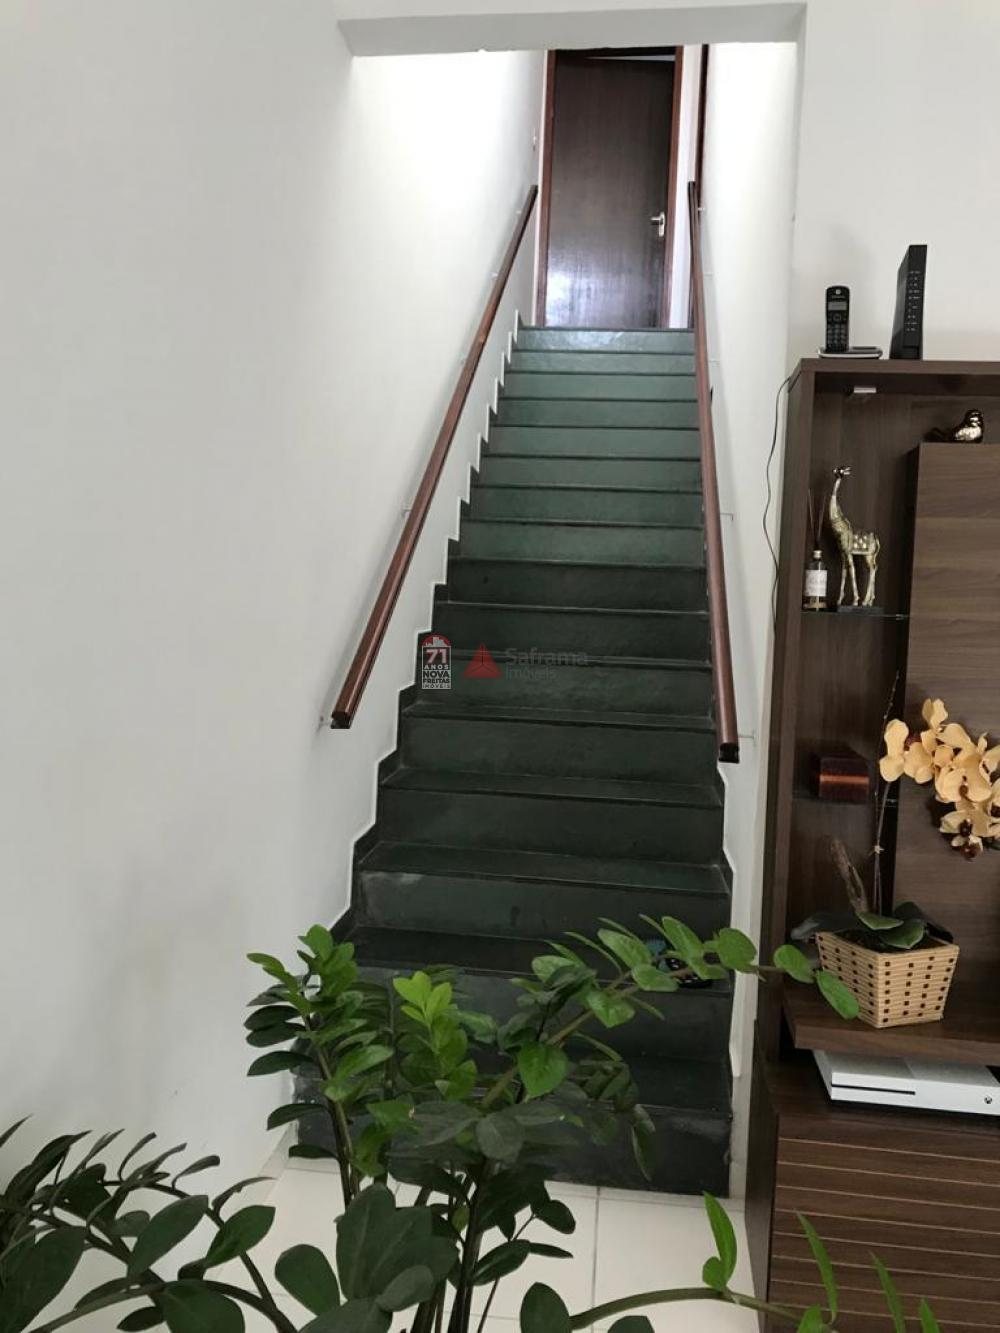 Comprar Casa / Sobrado em Pindamonhangaba R$ 290.000,00 - Foto 6